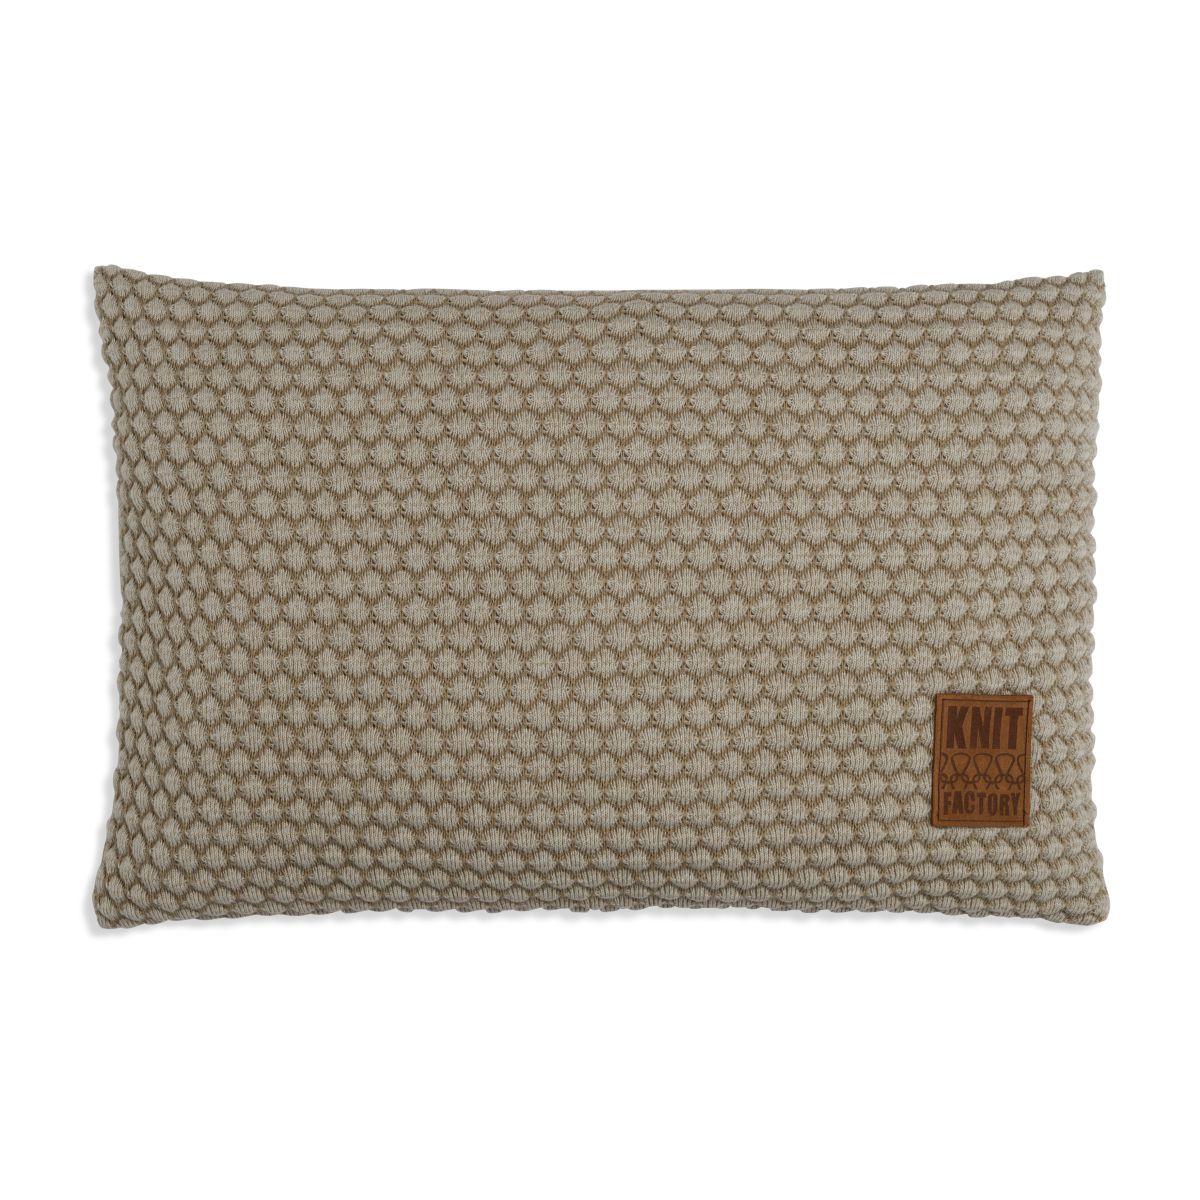 knit factory 1241357 kussen 60x40 juul seda olive 1